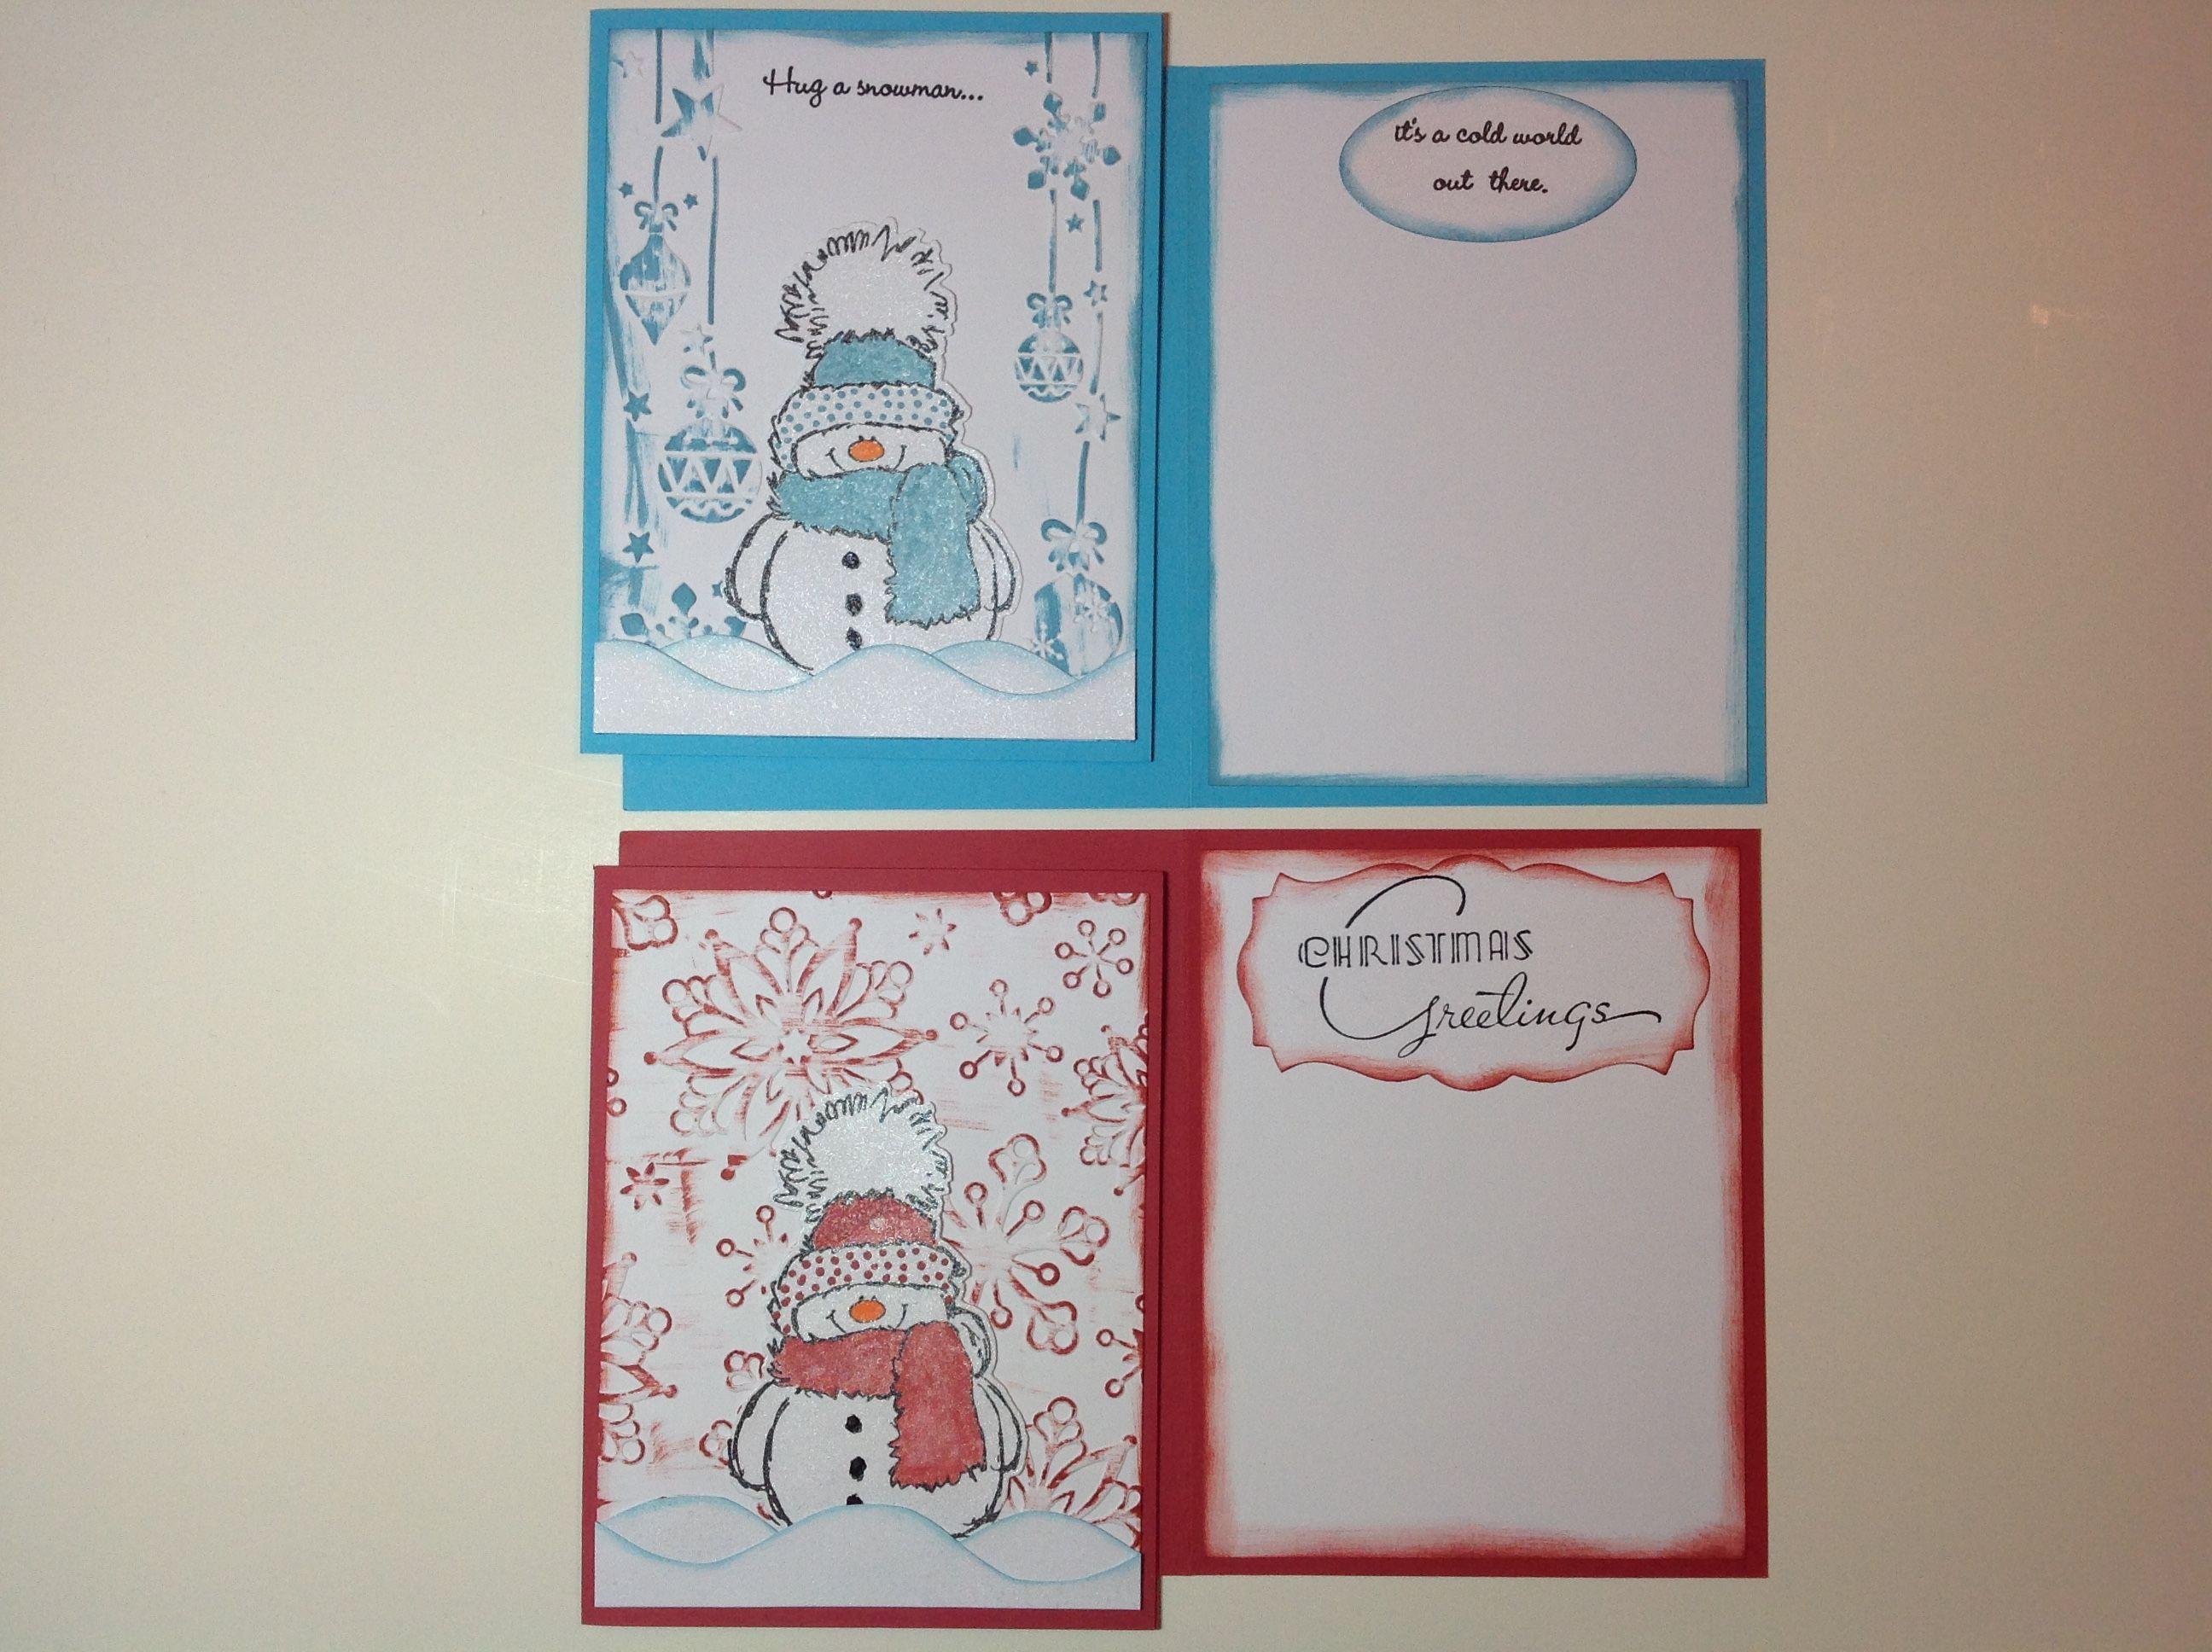 Winterxmas cards blue darice embossing folder morning star winterxmas cards blue darice embossing folder morning star greeting stamp kristyandbryce Images